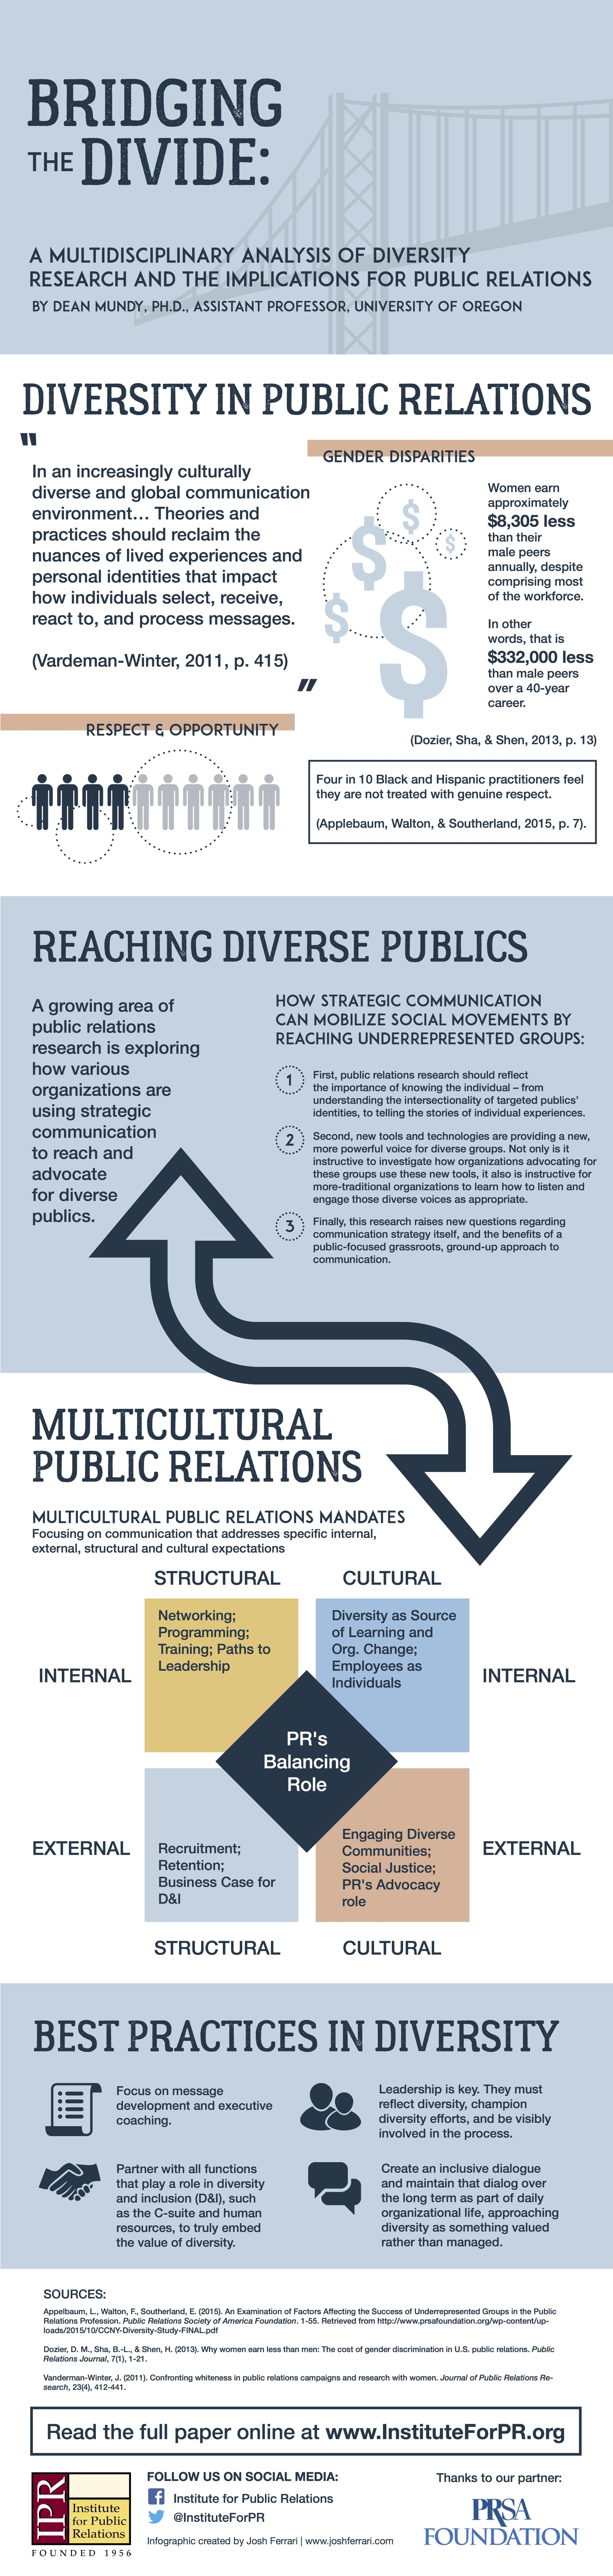 Diversity-Dean-Mundy-IPR-Infographic.png